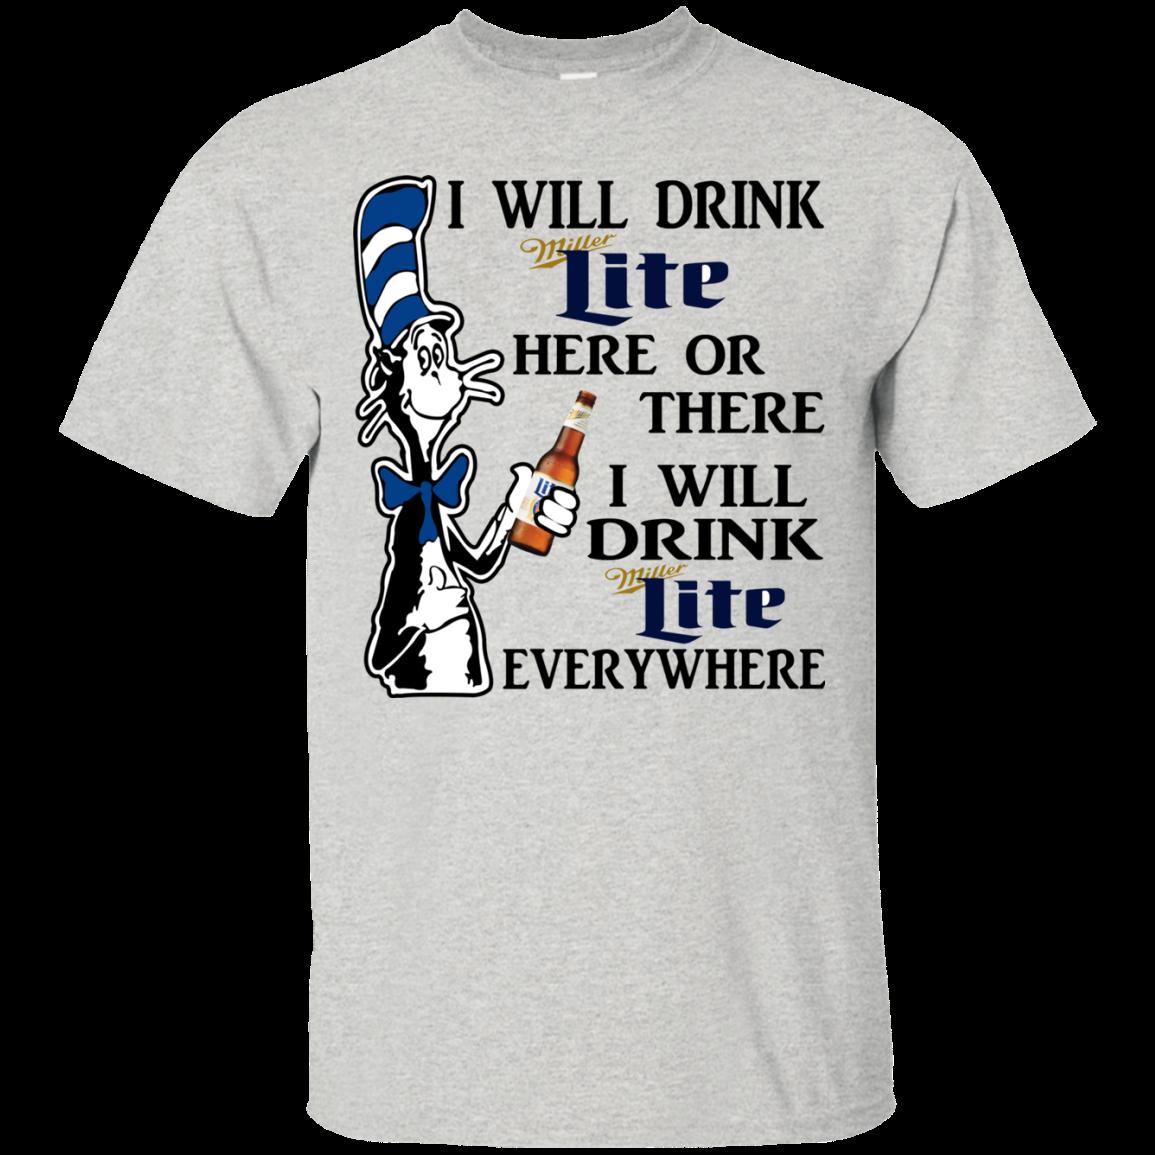 Dr seuss i will drink miller lite here or there shirt for Vintage miller lite shirt